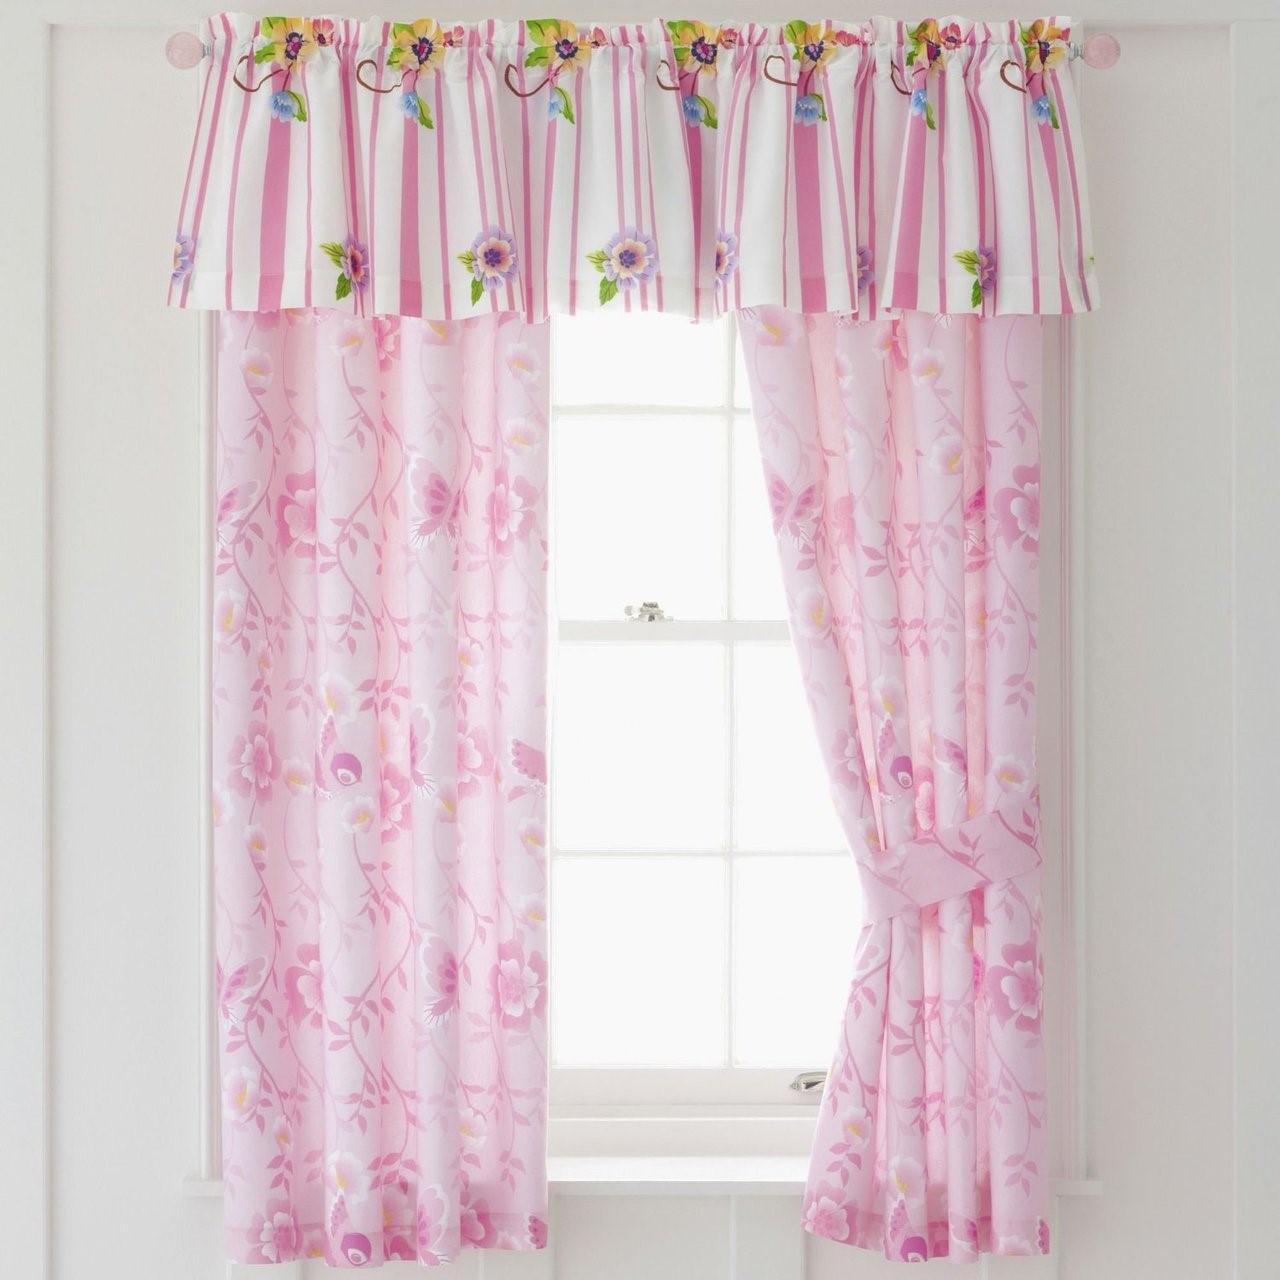 82 Inch Shower Curtain. Hookless Hookless RBH82MY251 Pique Mystery Brown DiamondCarlton 72